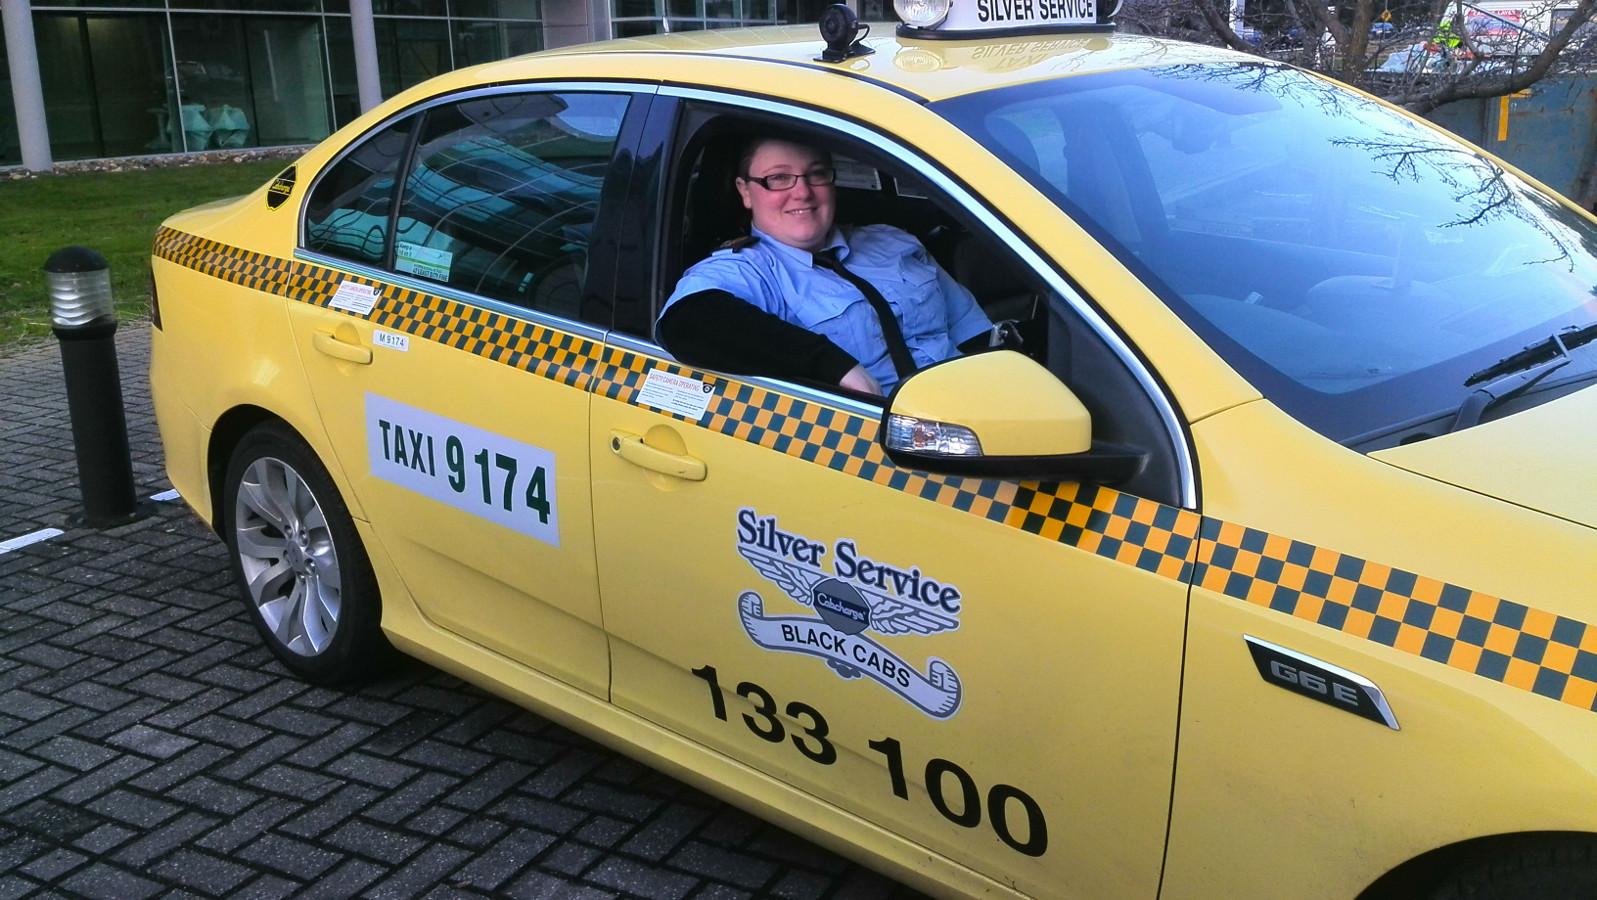 Providing Silver Service, Premium Quality Drivers